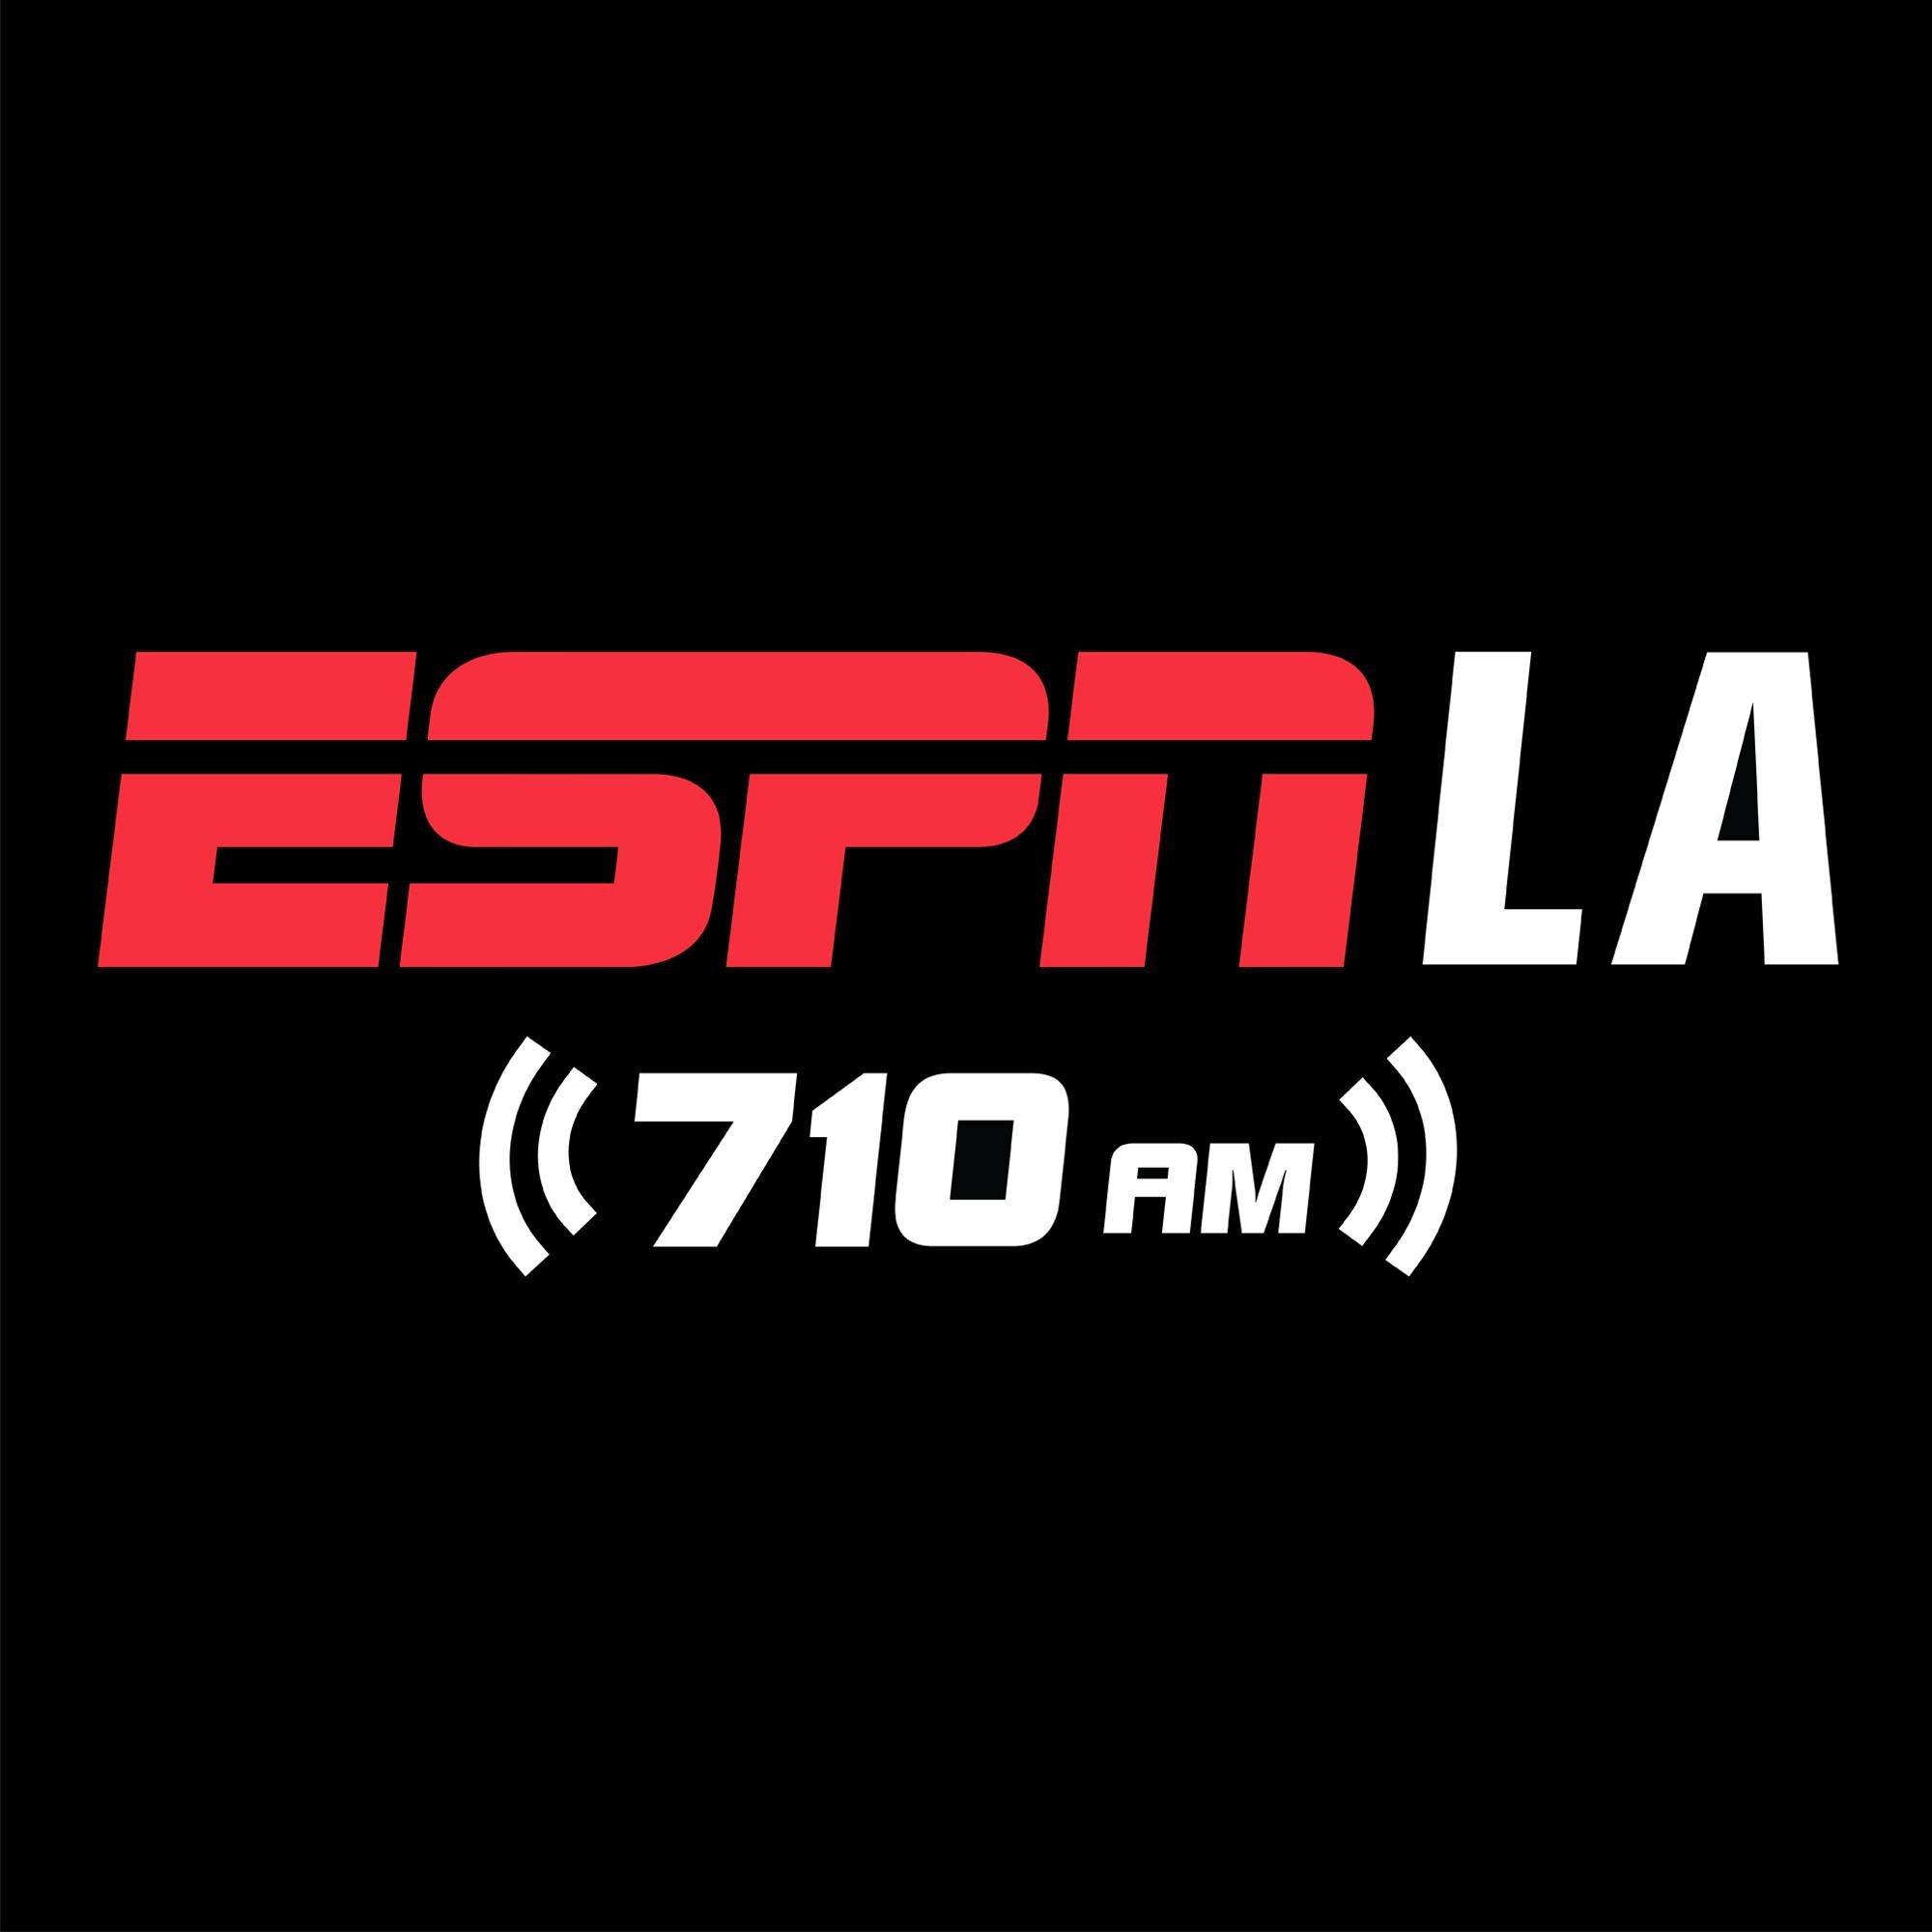 ESPNLA710 Has Moved! Social Profile